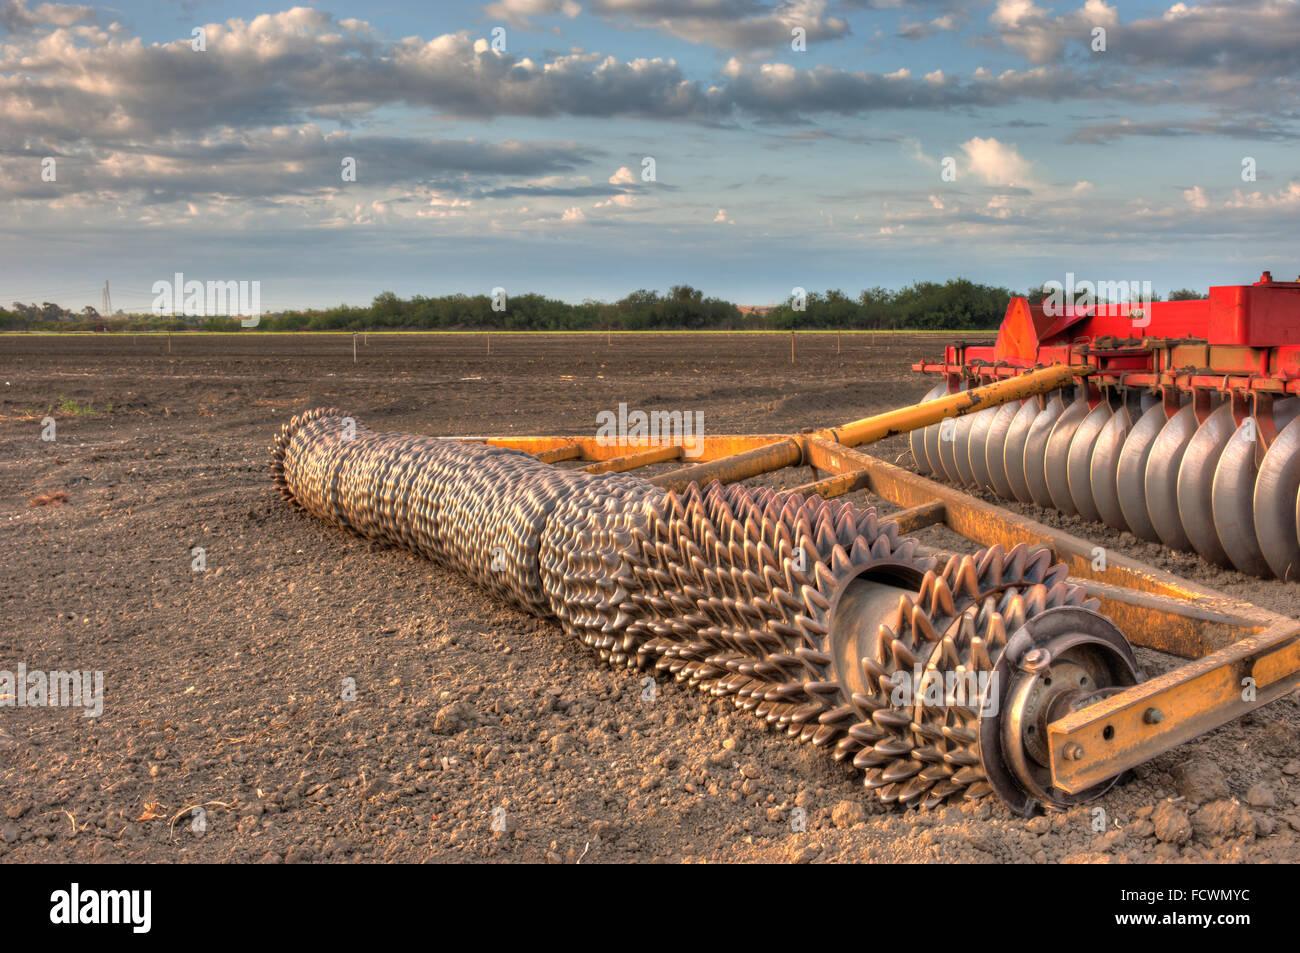 Disc harrow attachment for farm tractor - Stock Image